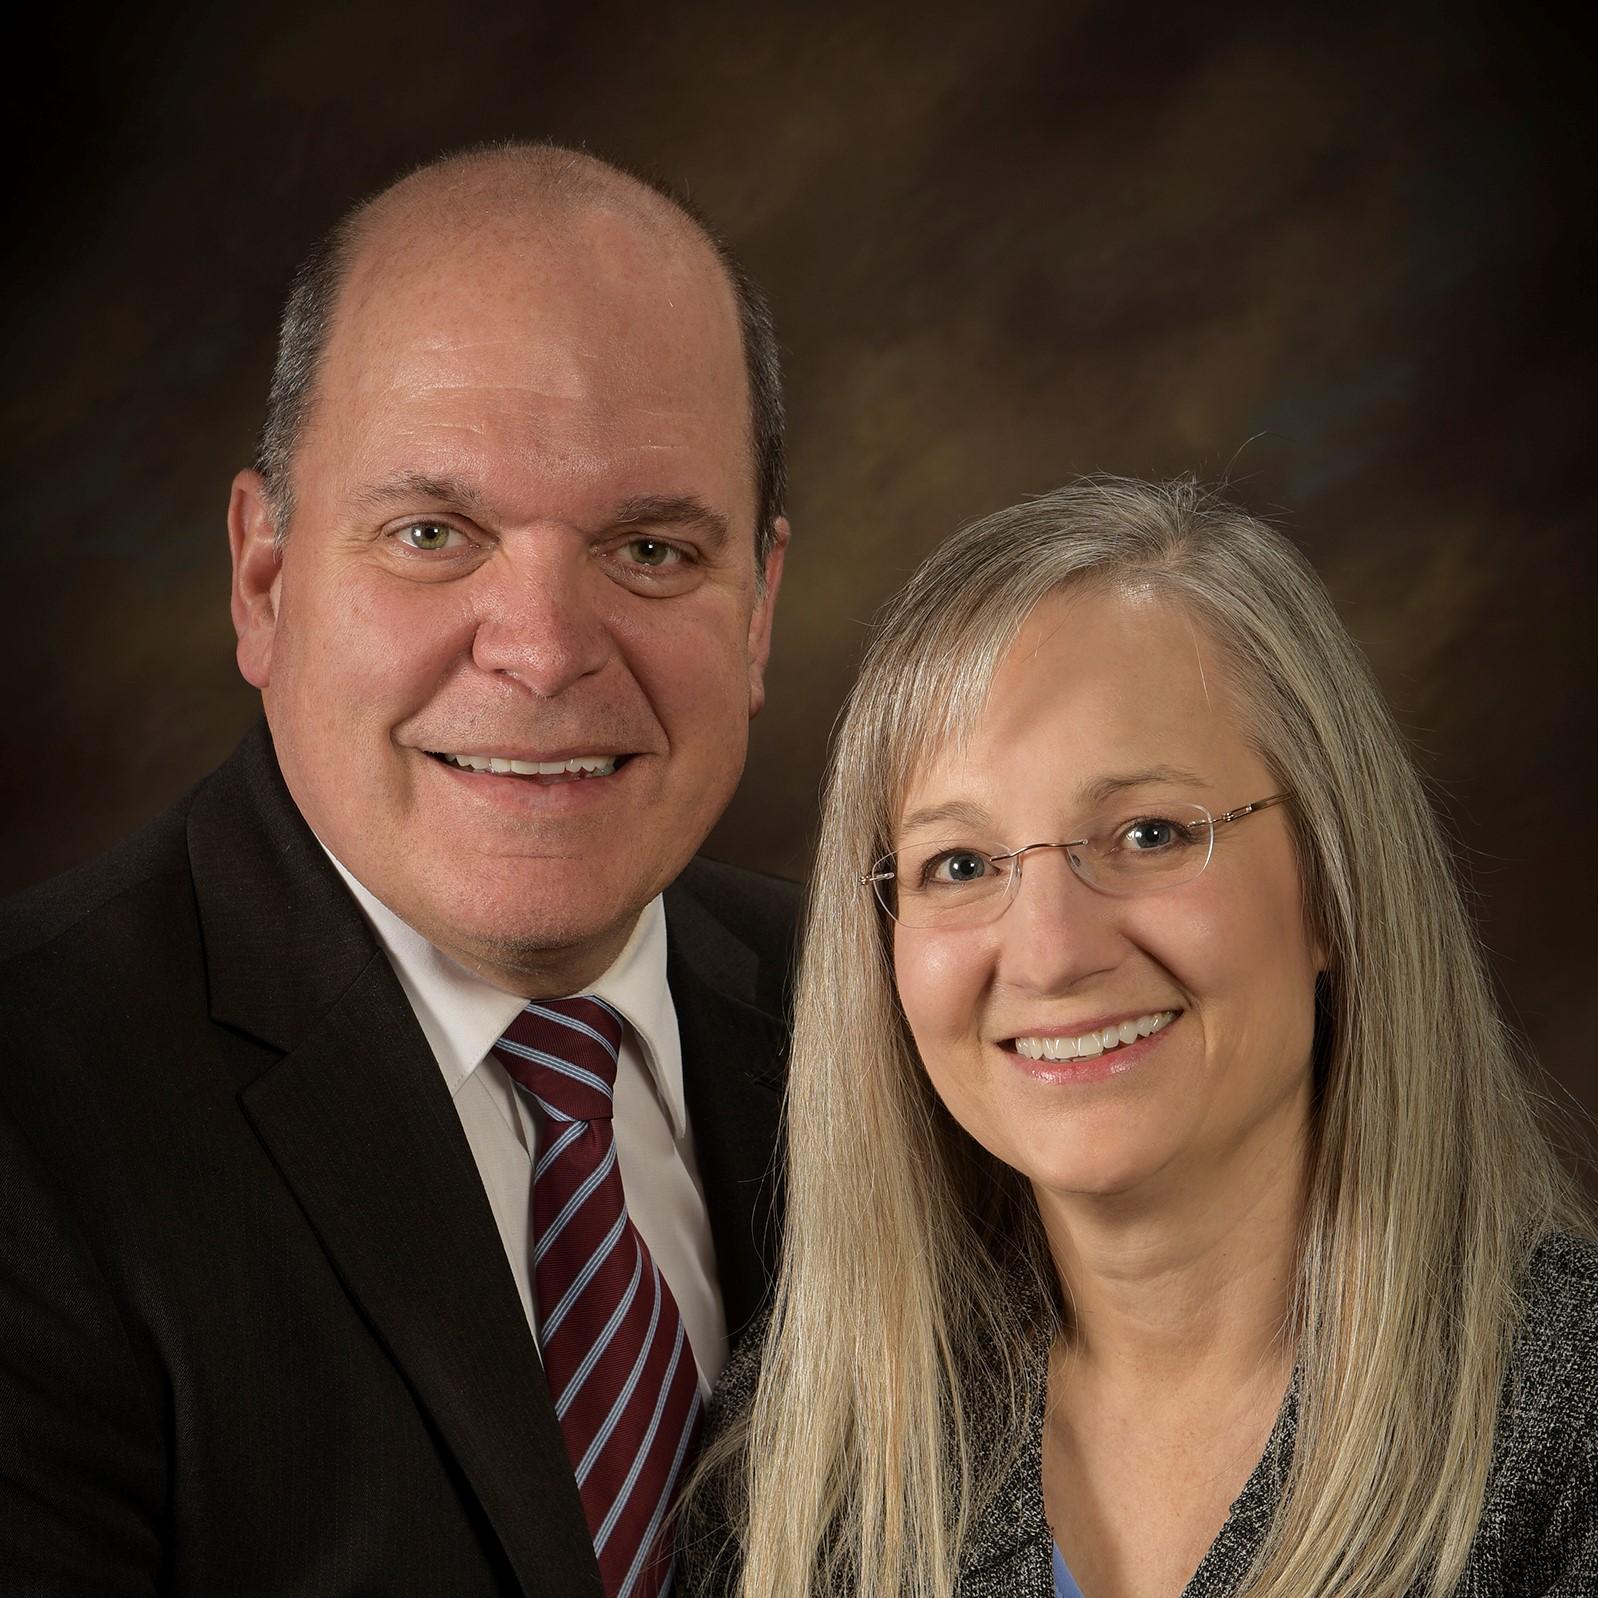 Jeffery G. and Kristi Ann Chapman